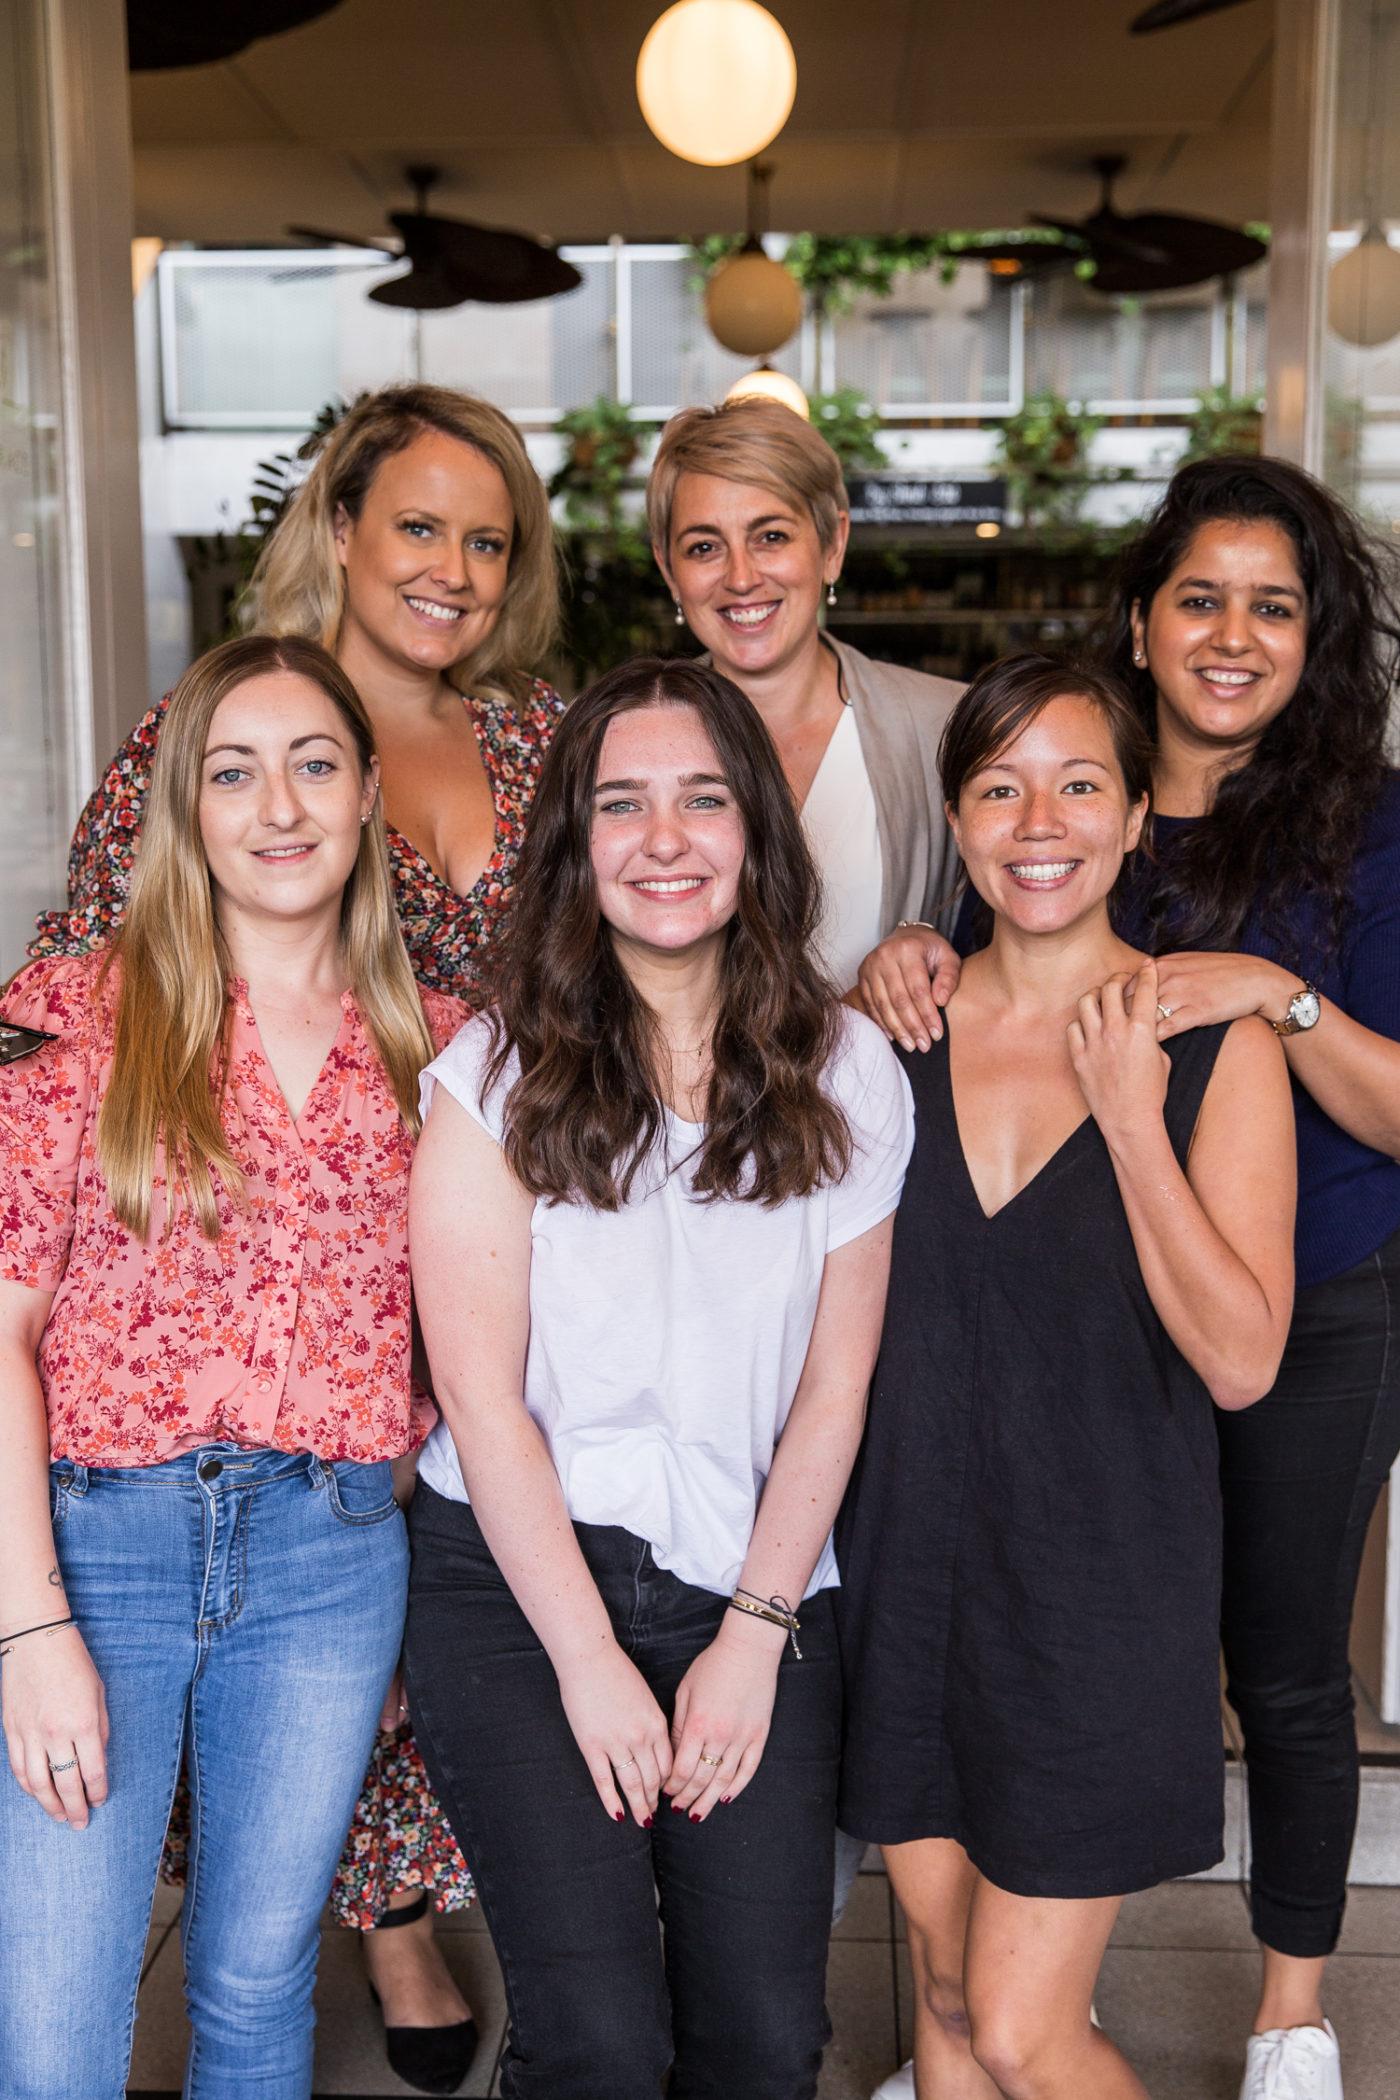 Applejack international women's day 2020